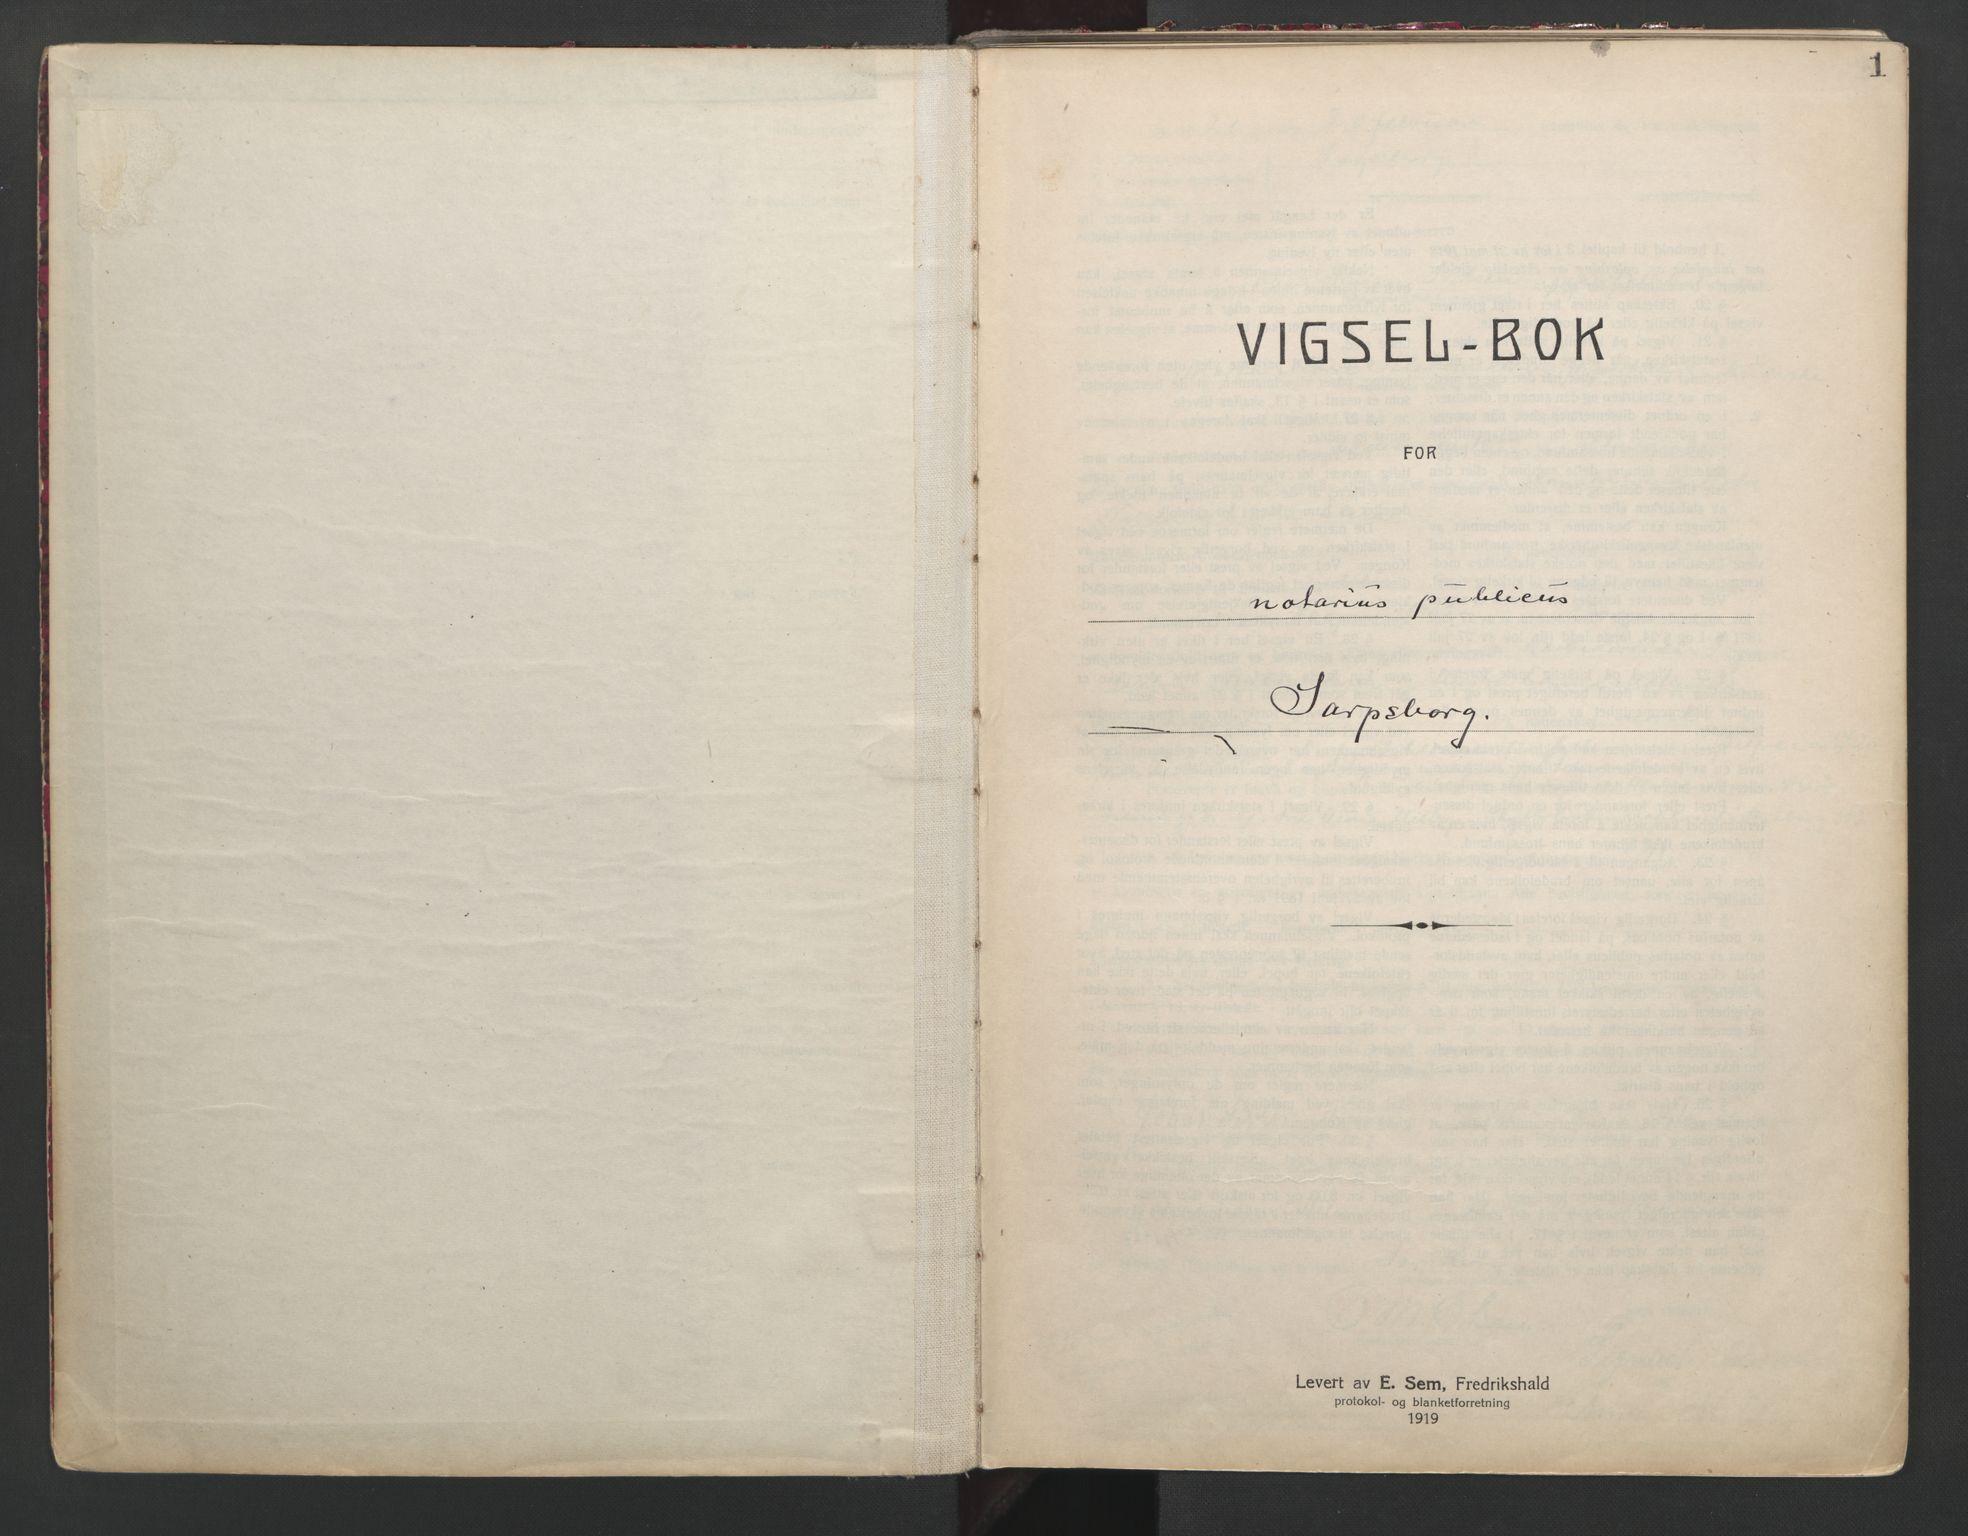 SAO, Sarpsborg byfogd, L/Lb/Lba/L0001: Vigselbok, 1920-1941, s. 1